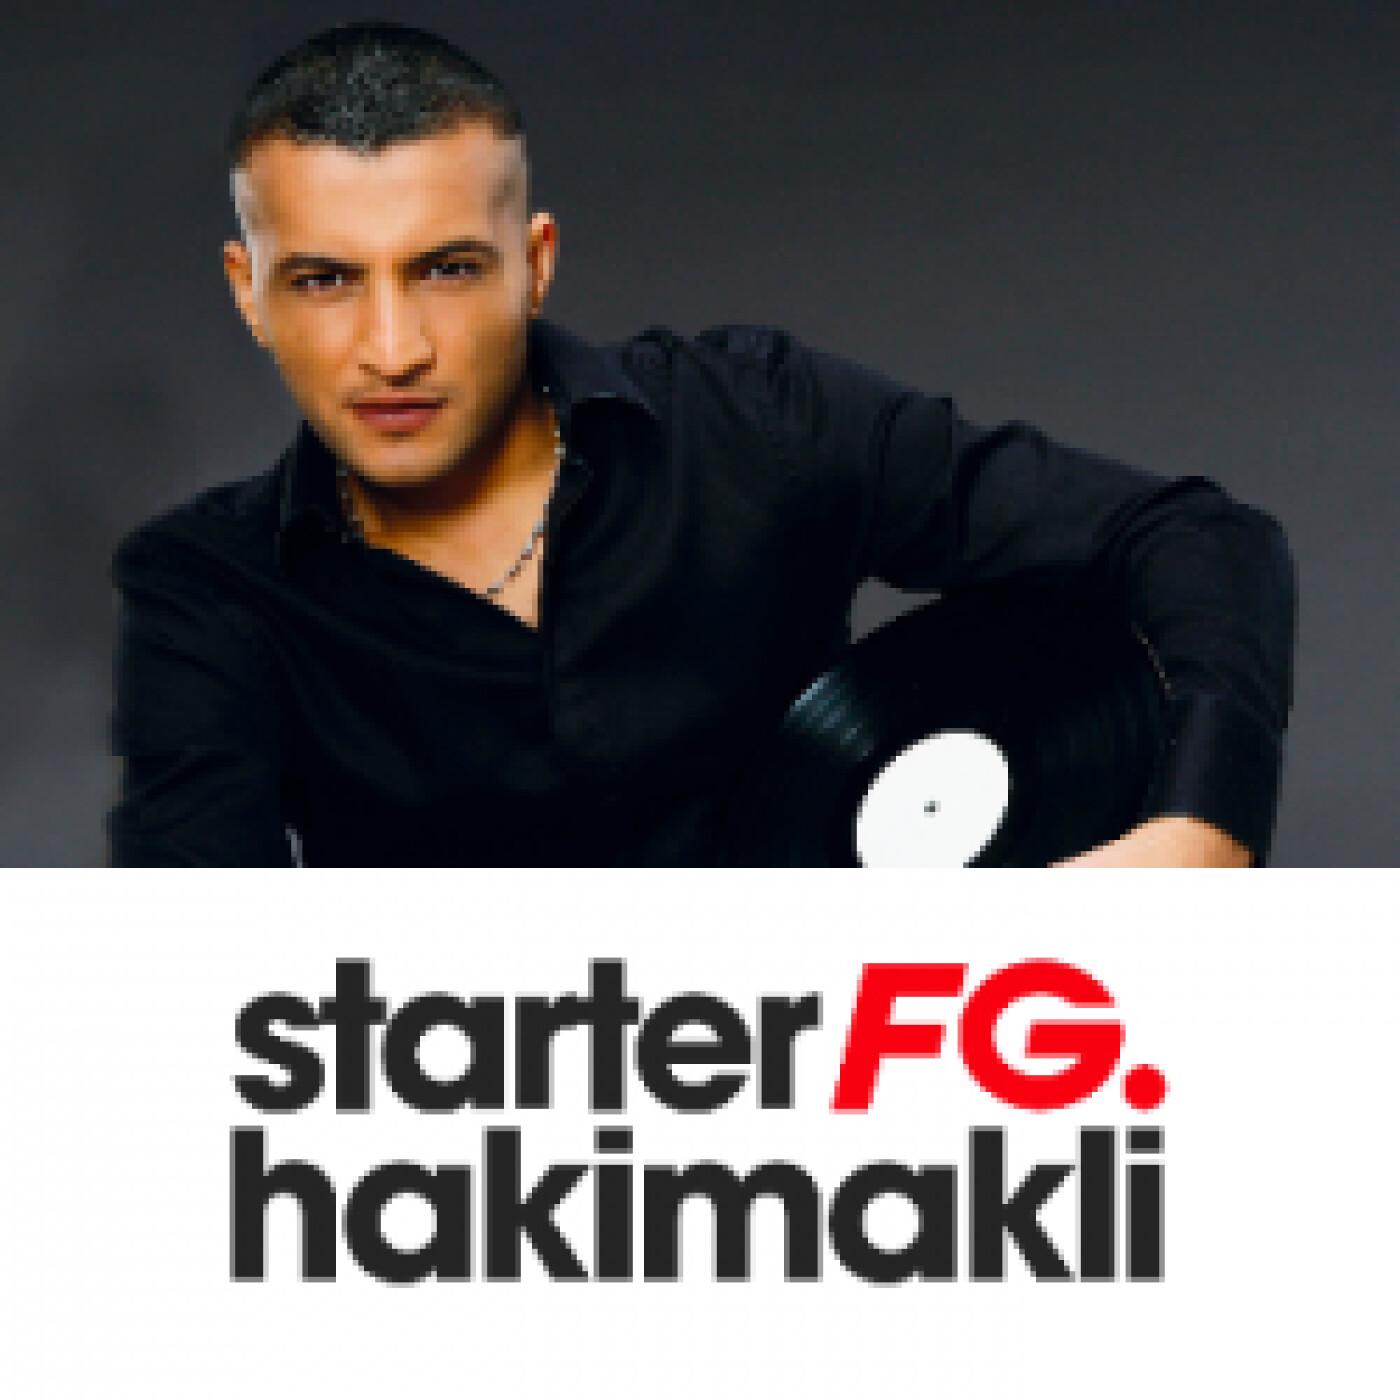 STARTER FG BY HAKIMAKLI SAMEDI 12 JUIN 2021